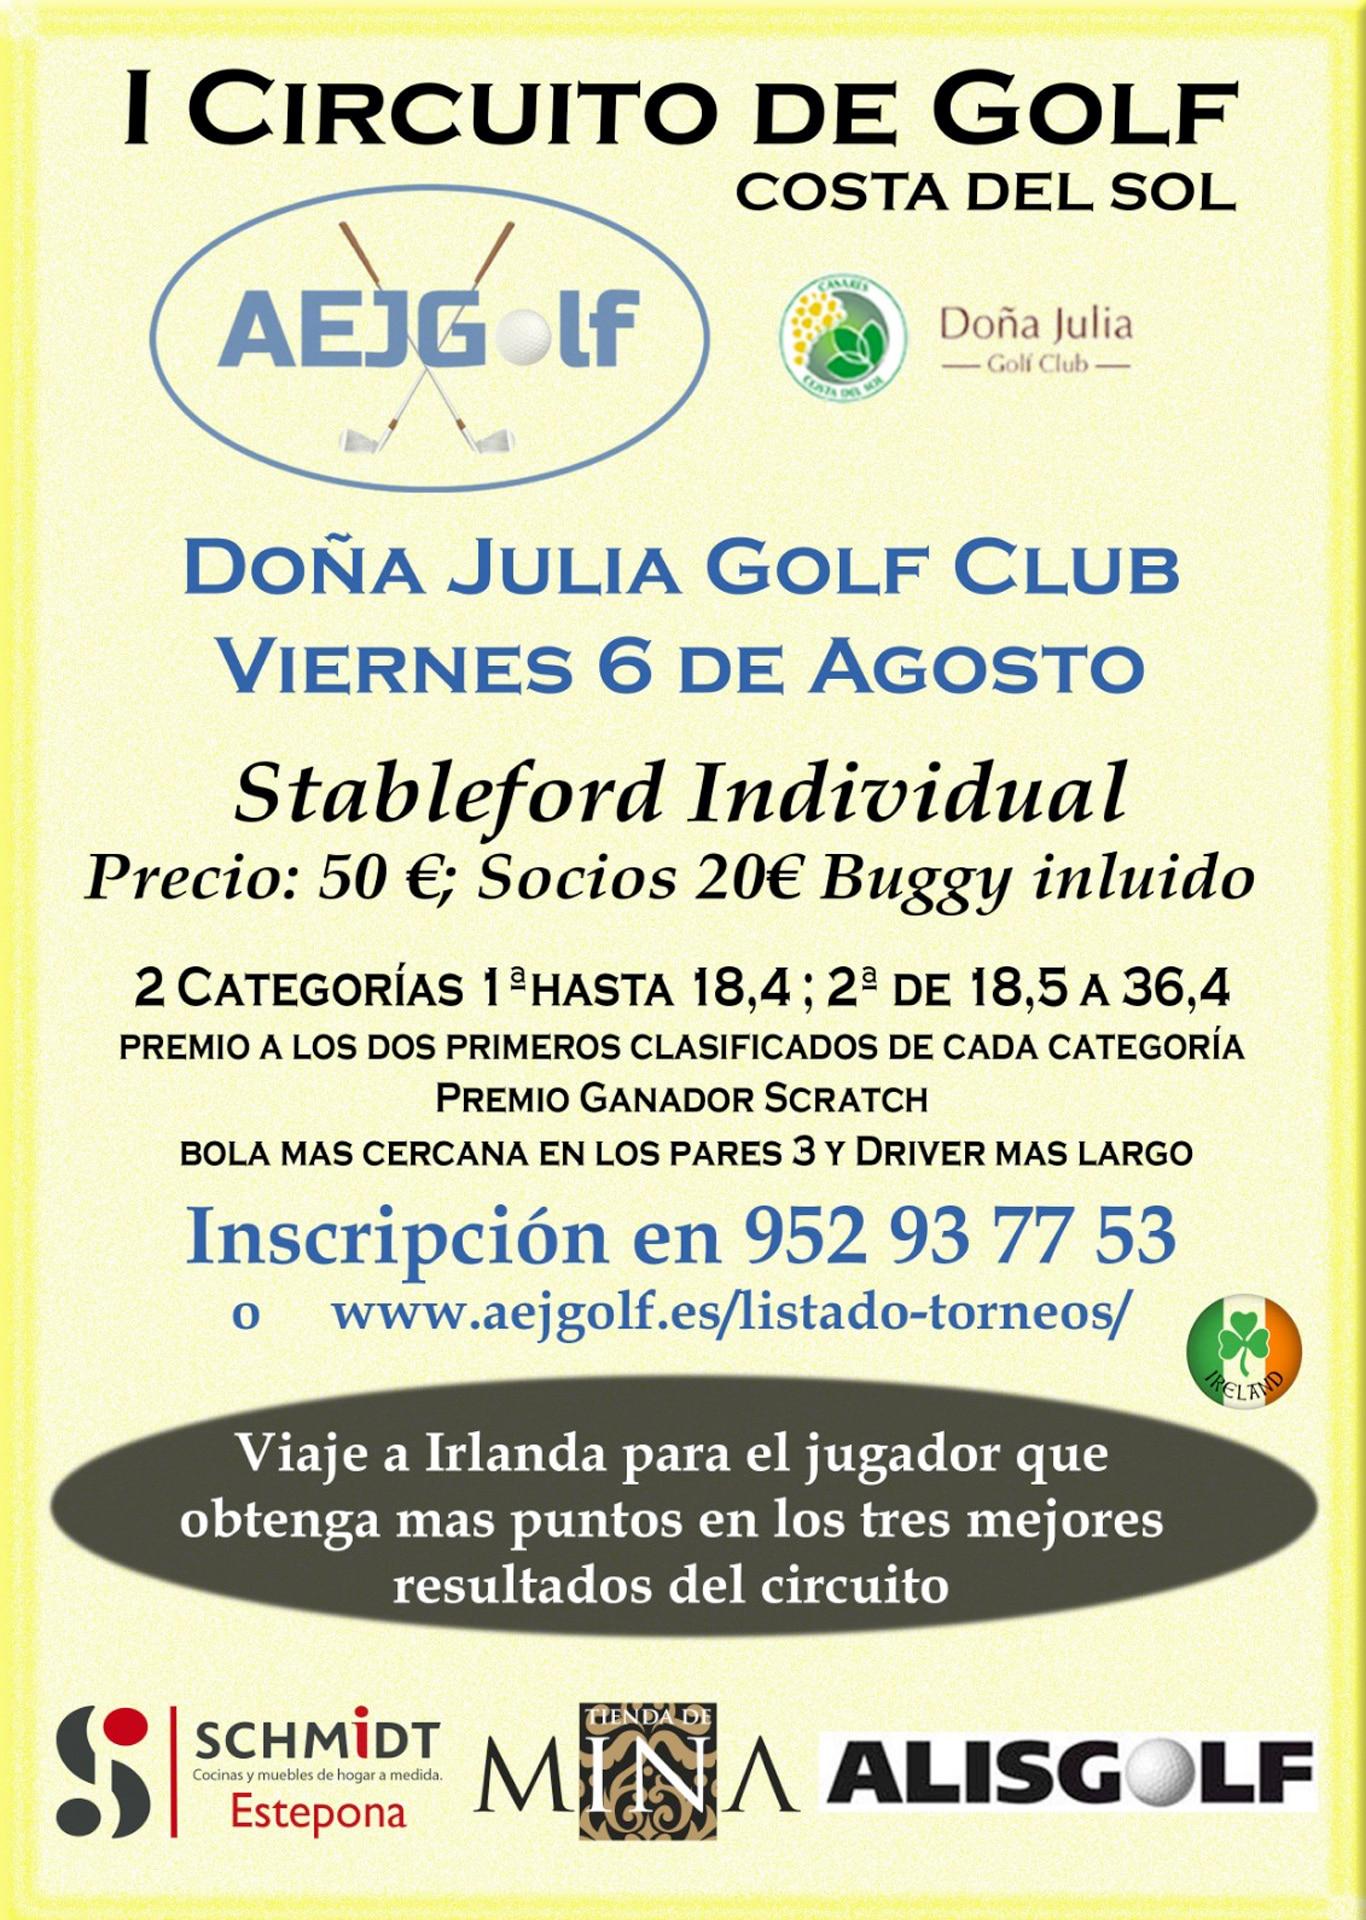 I circuito de golf costa del sol AEJGOLF